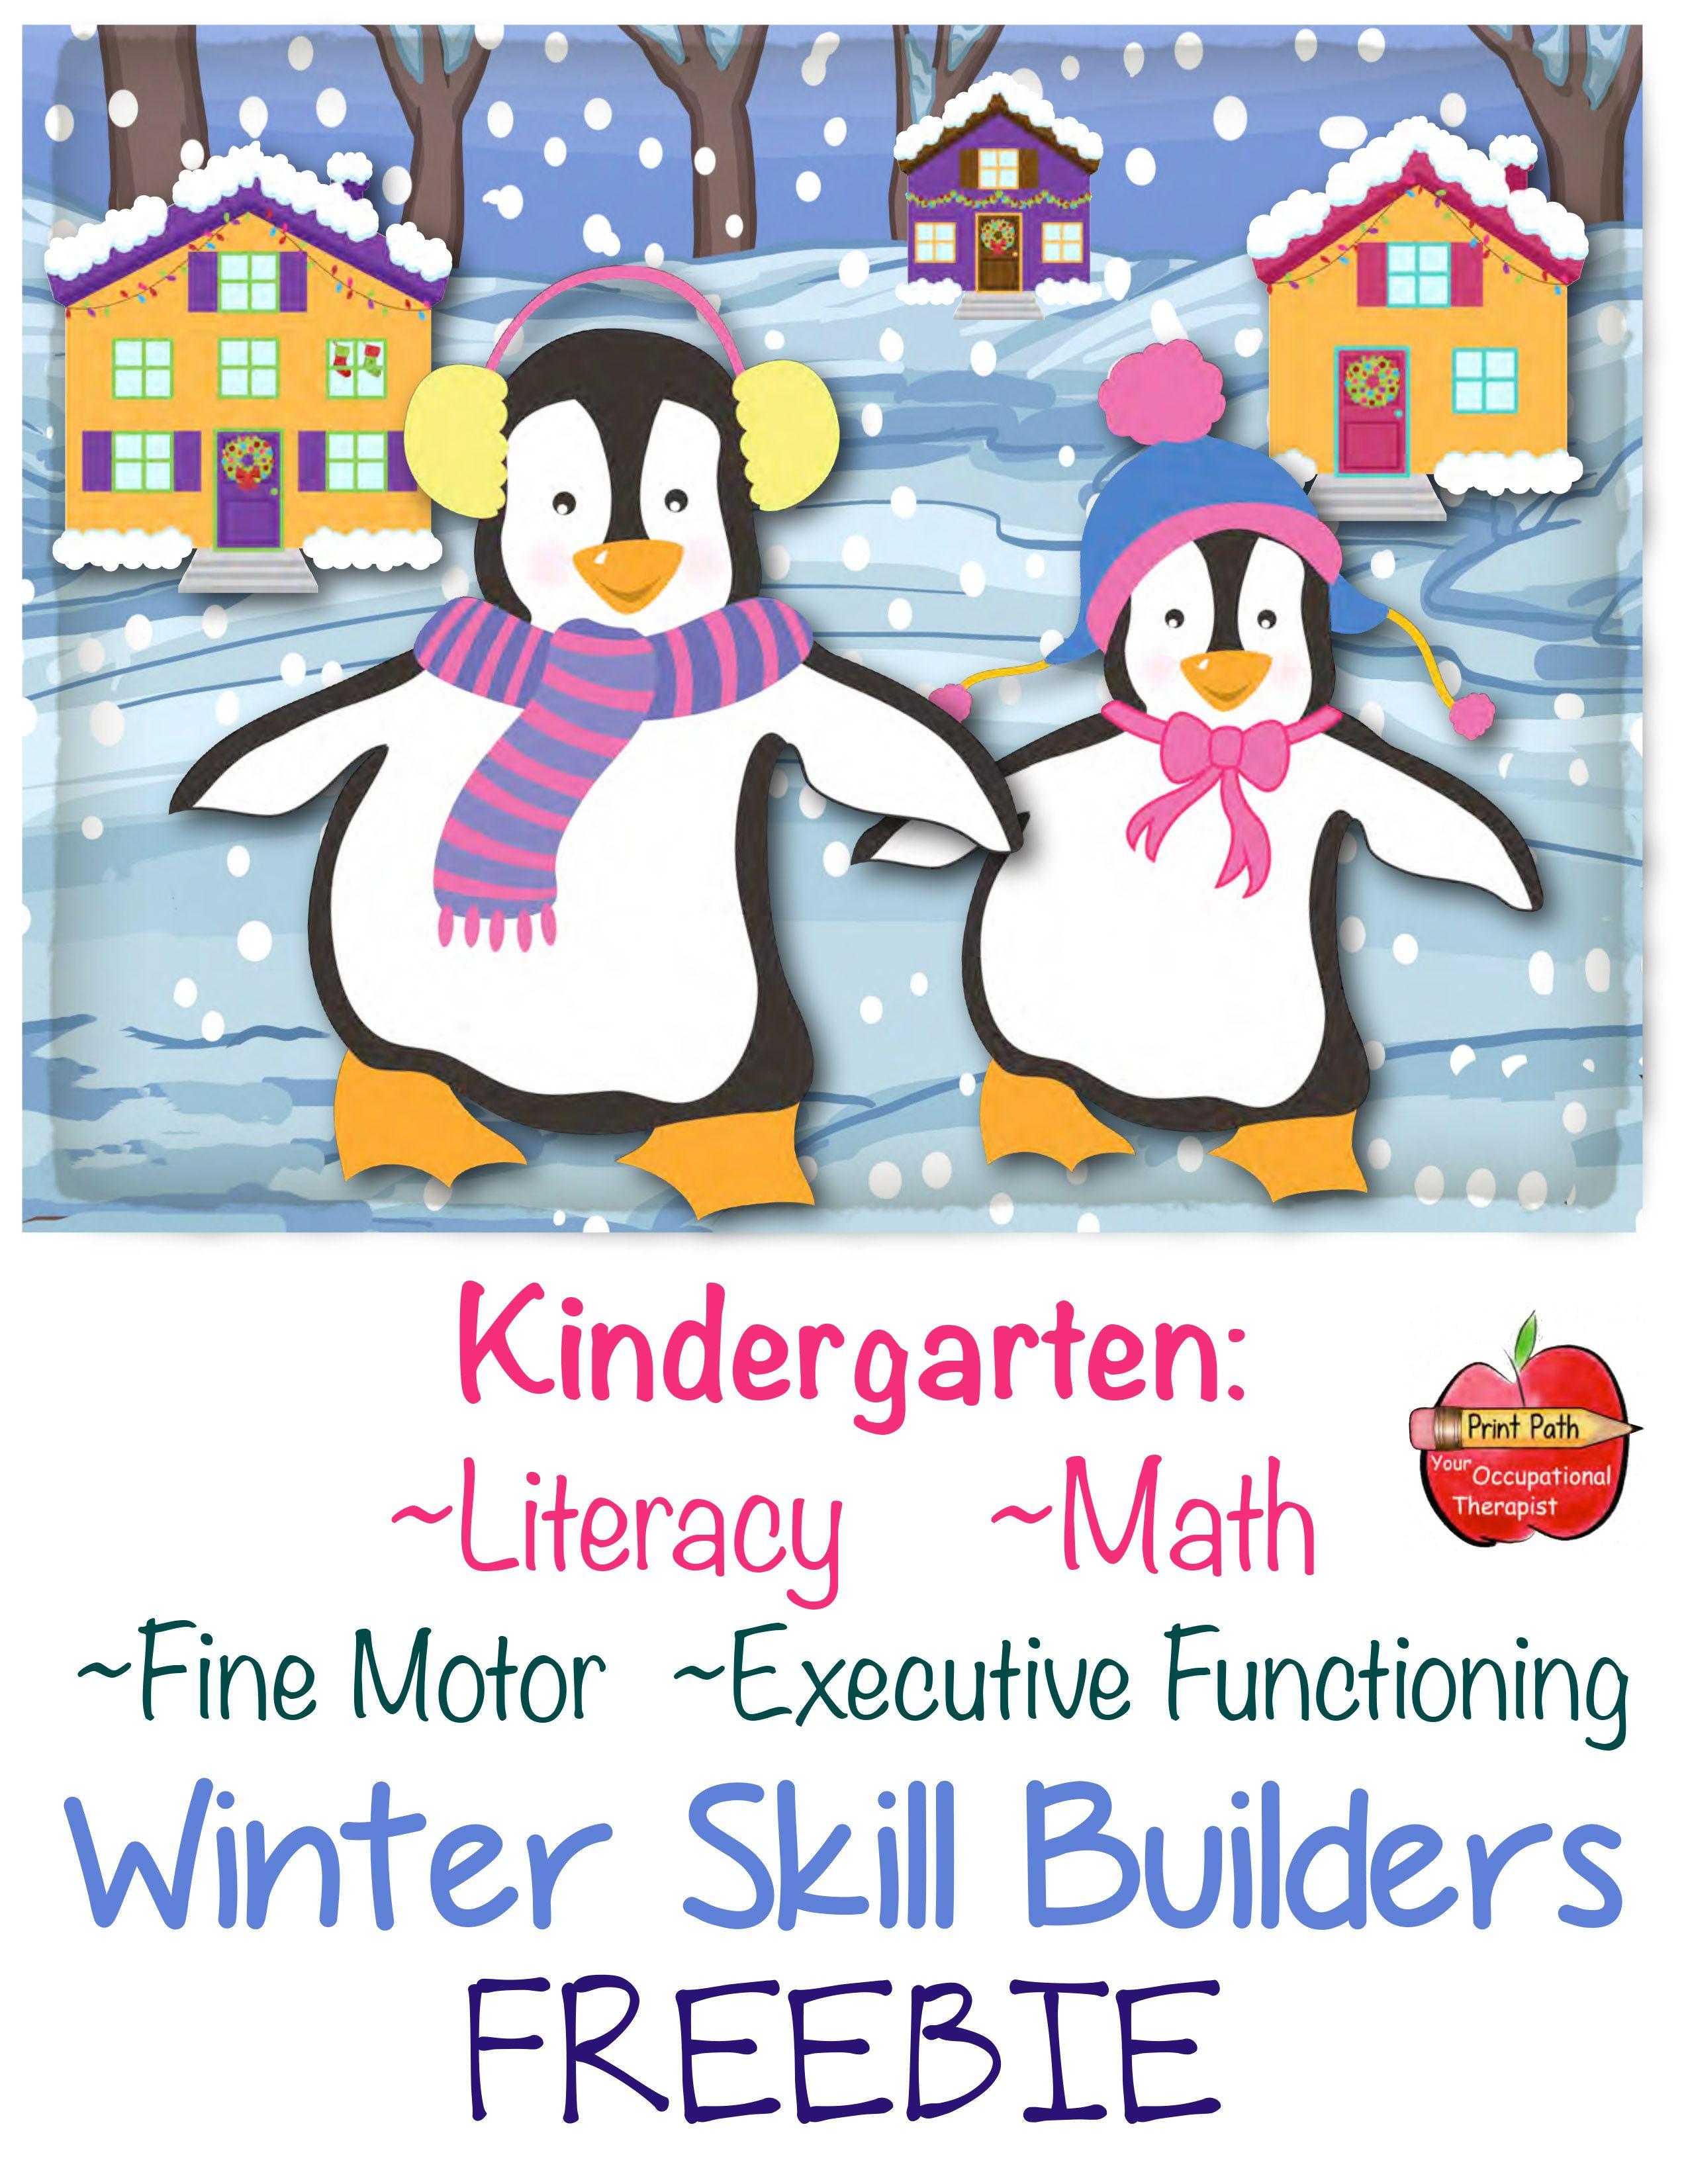 Free Literacy Math Fine Motor Executive Functioning